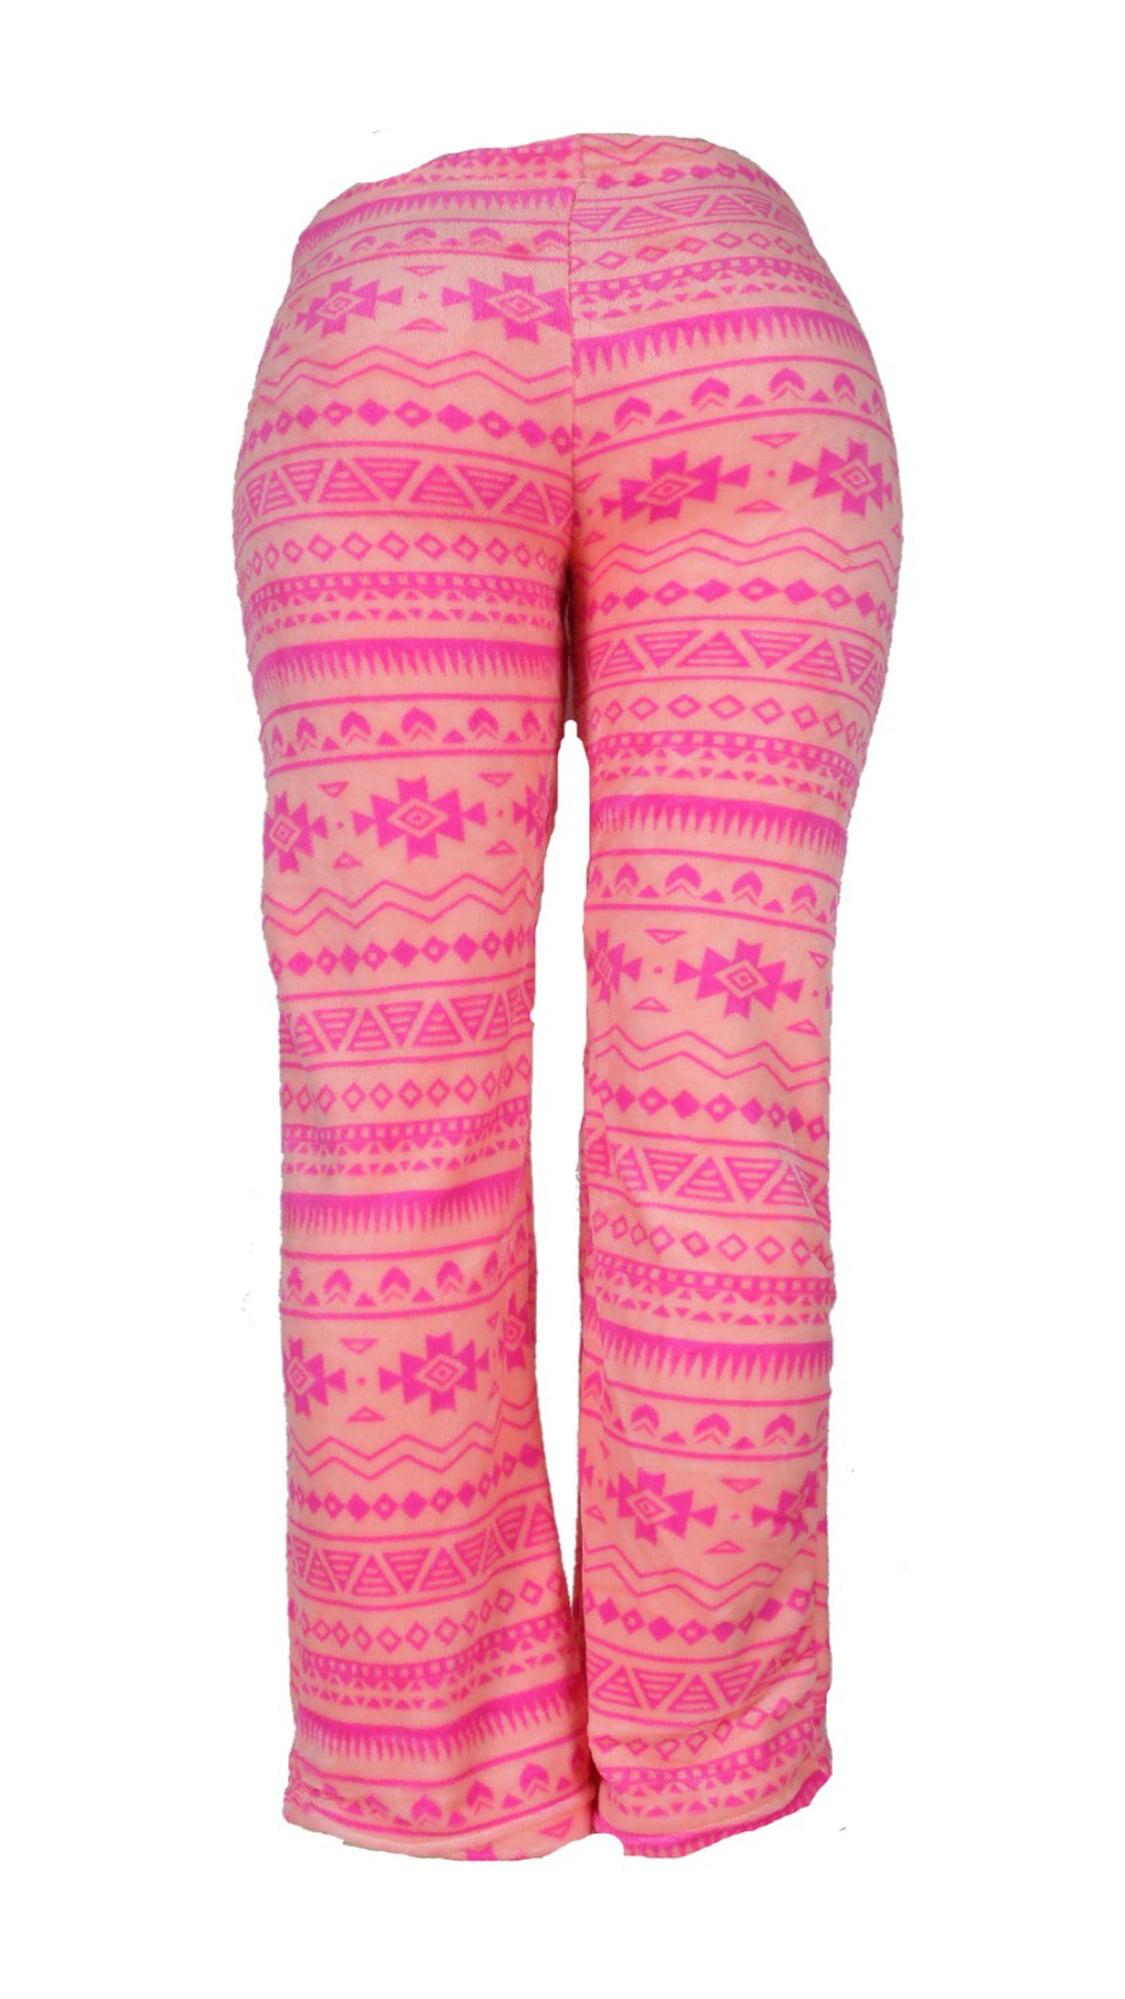 Yacht /& Smith Womens Butter Soft Fleece Fuzzy Lounge Pants One Size Lips Print